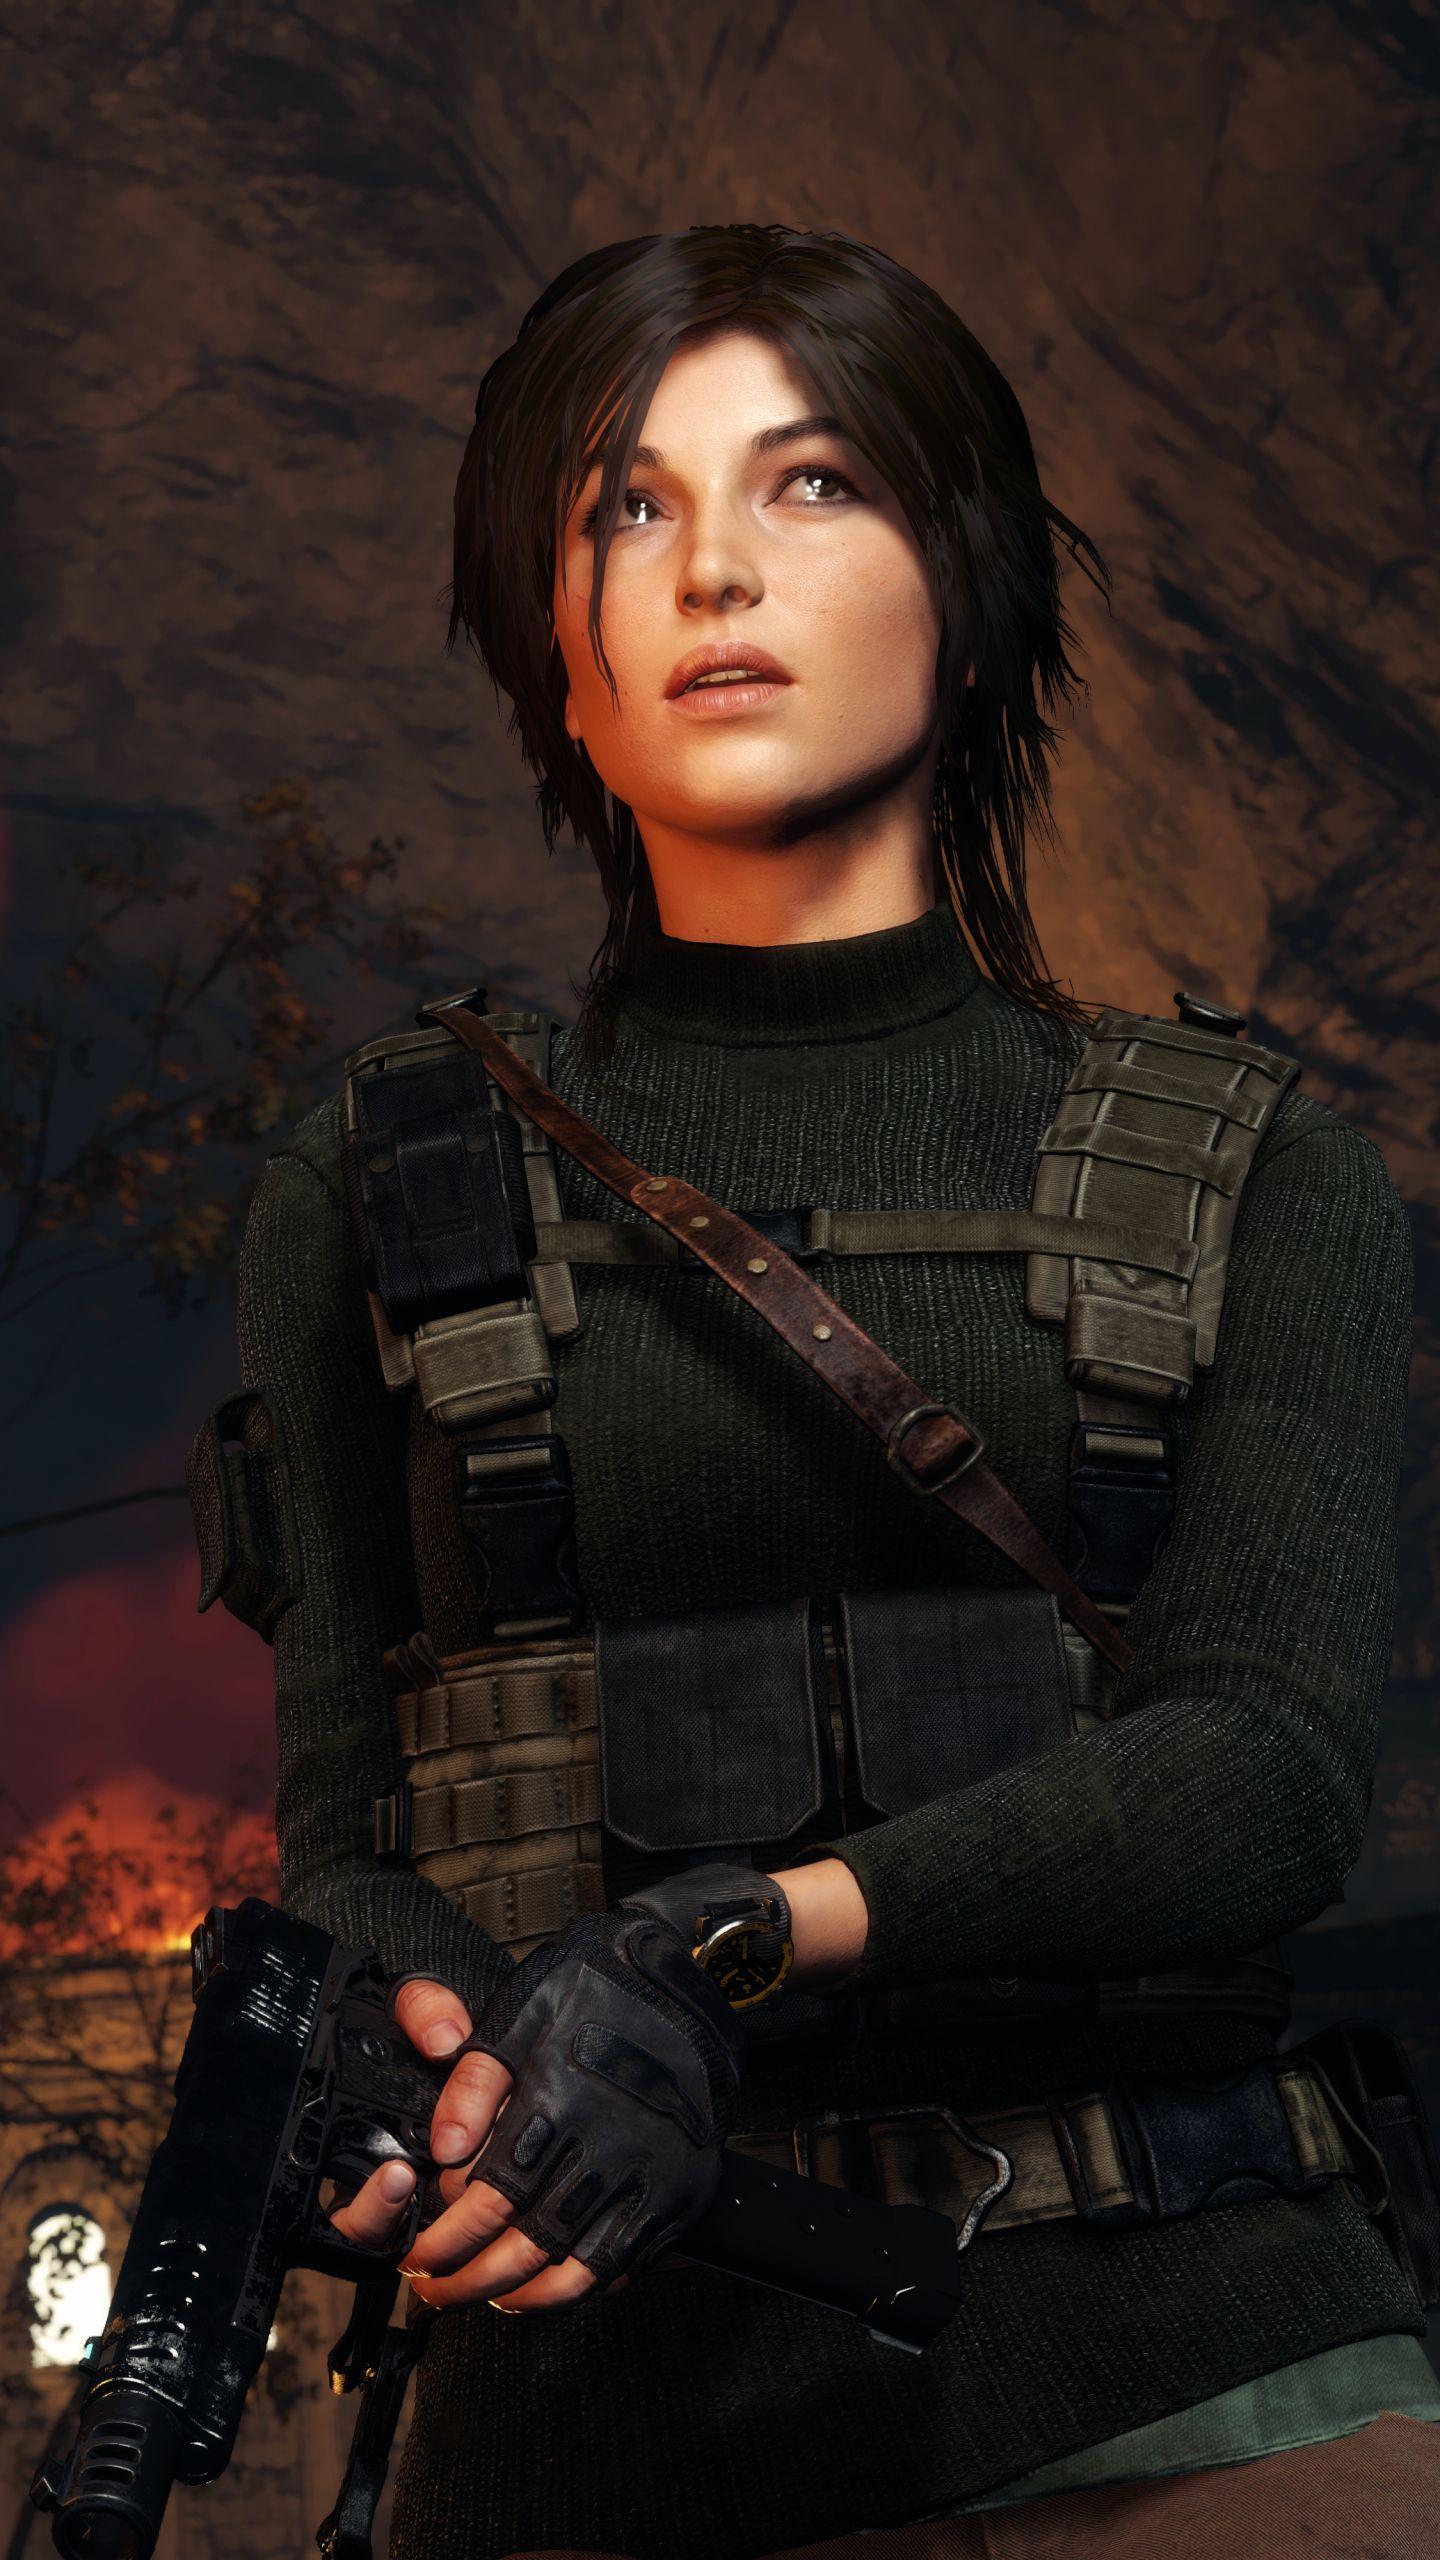 Tomb Raider Wallpapers Wallpaper Tomb Raider Tomb Raider Video Game New Tomb Raider